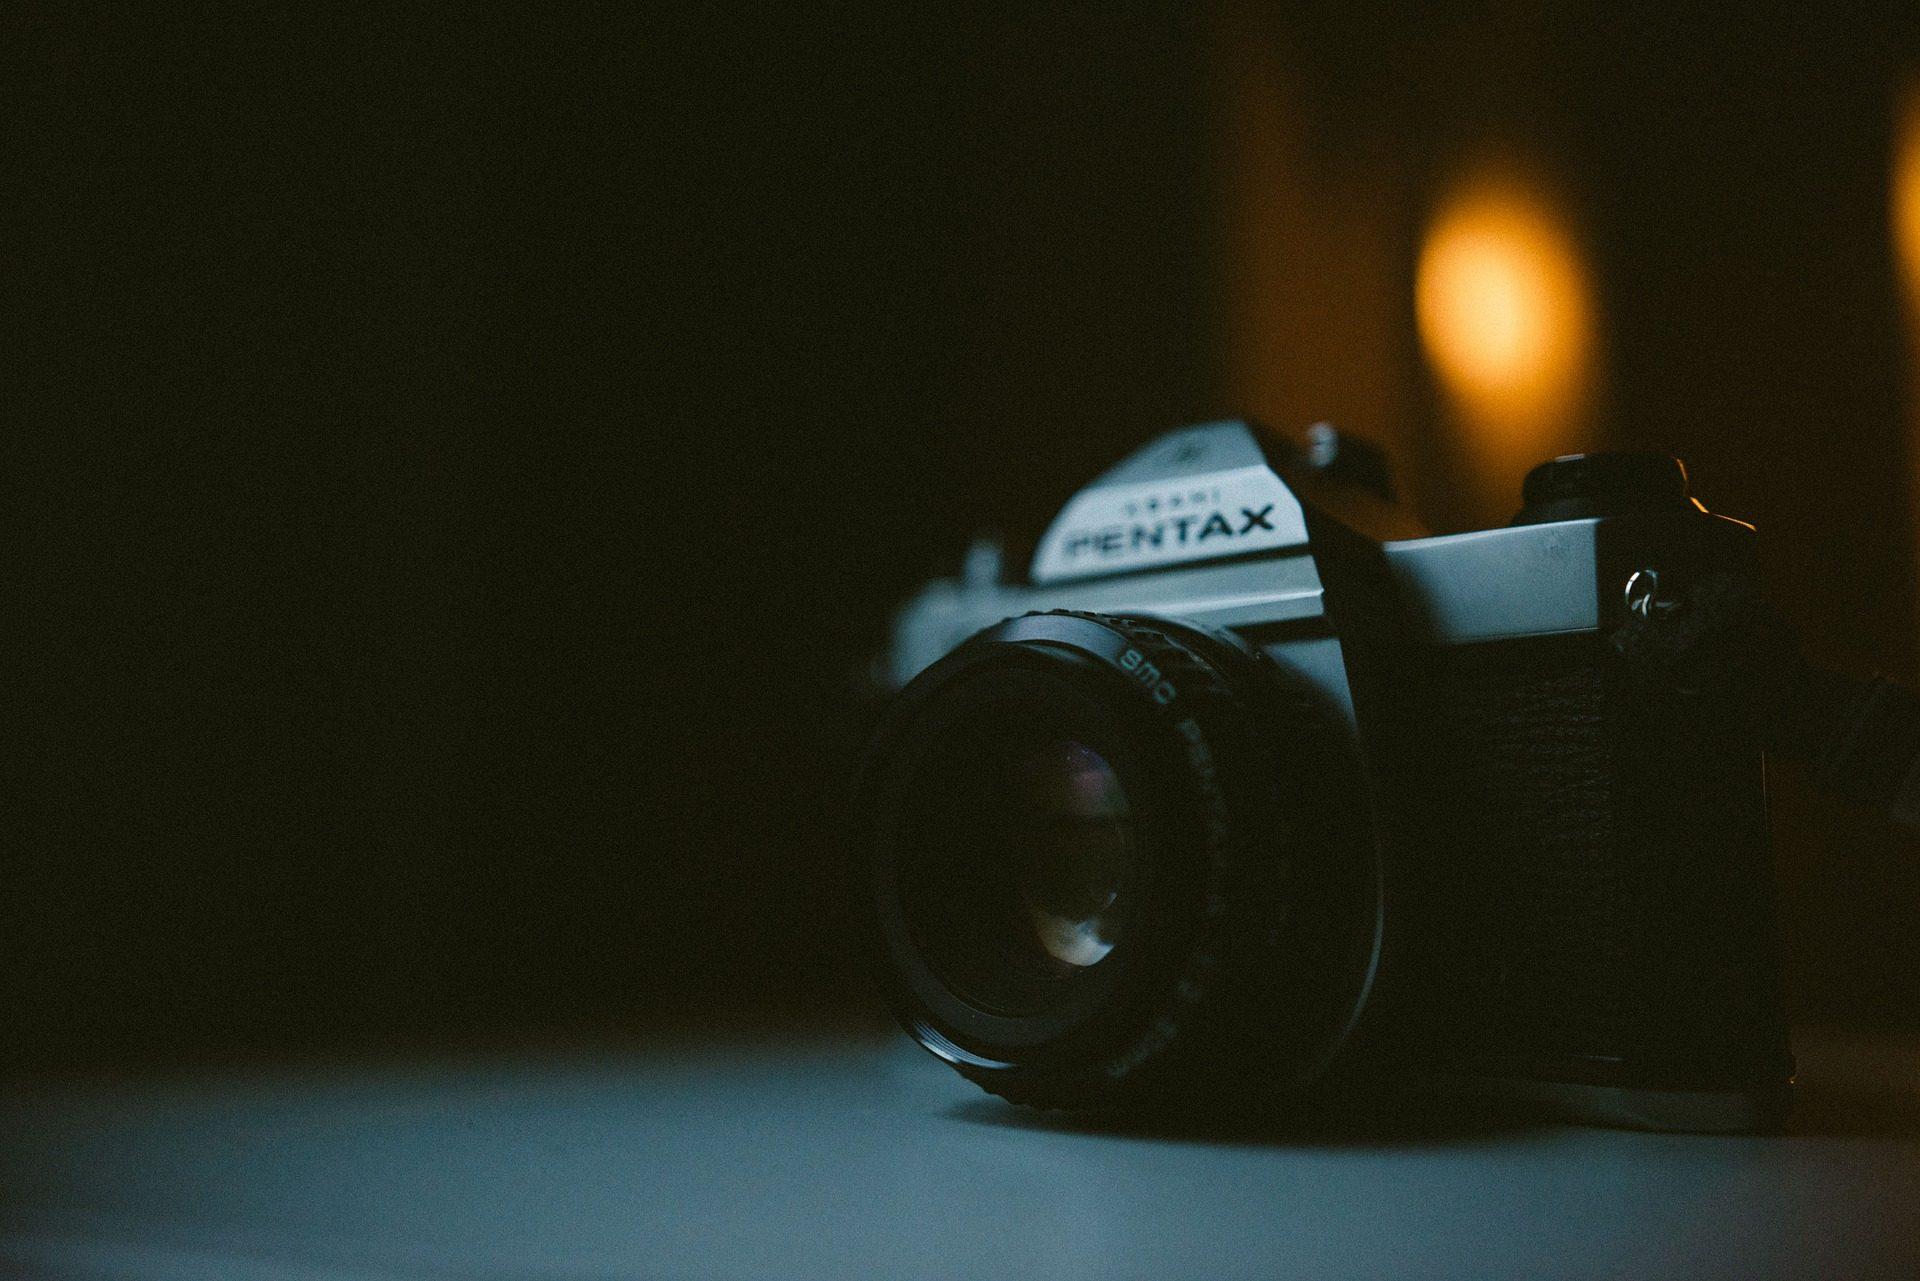 fotocamera, fotografia, analogico, vecchio, vintage - Sfondi HD - Professor-falken.com